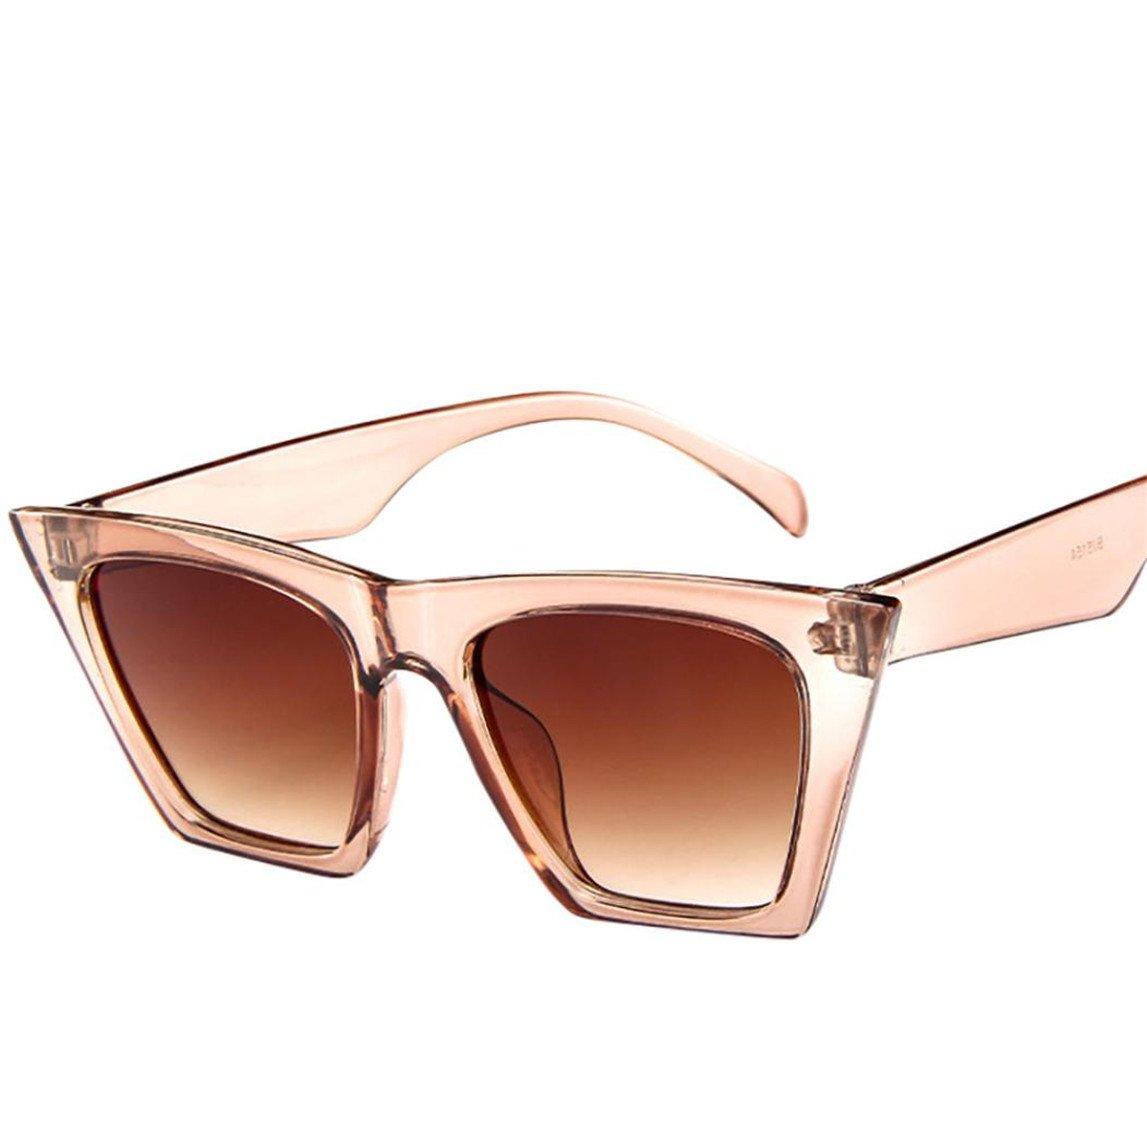 953fa0f2f3d733 Oversized Square Luxury Sunglasses for Women Fashion Retro Cat Eye  Sunglasses (Beige) at Amazon Women s Clothing store